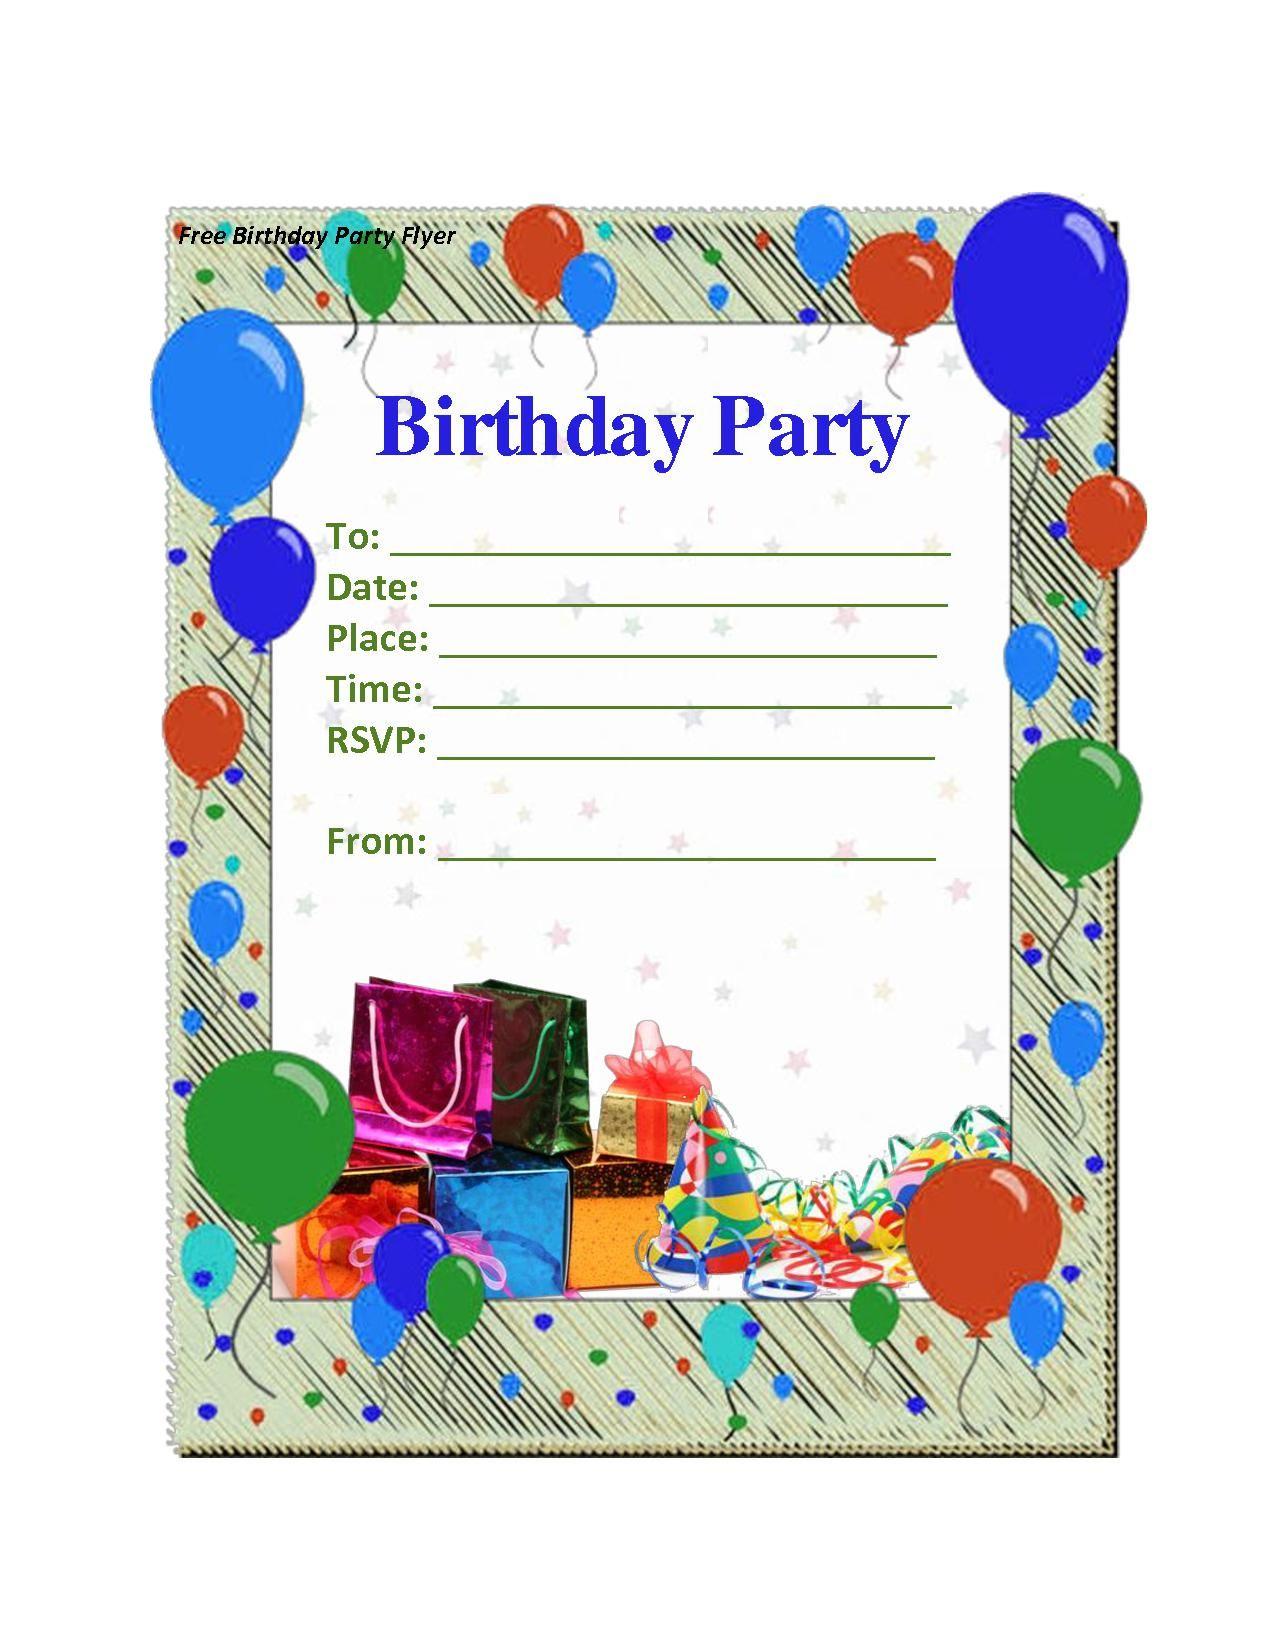 Free Party Invitation Maker Online | Star Wars Party Invitation - Make Printable Party Invitations Online Free